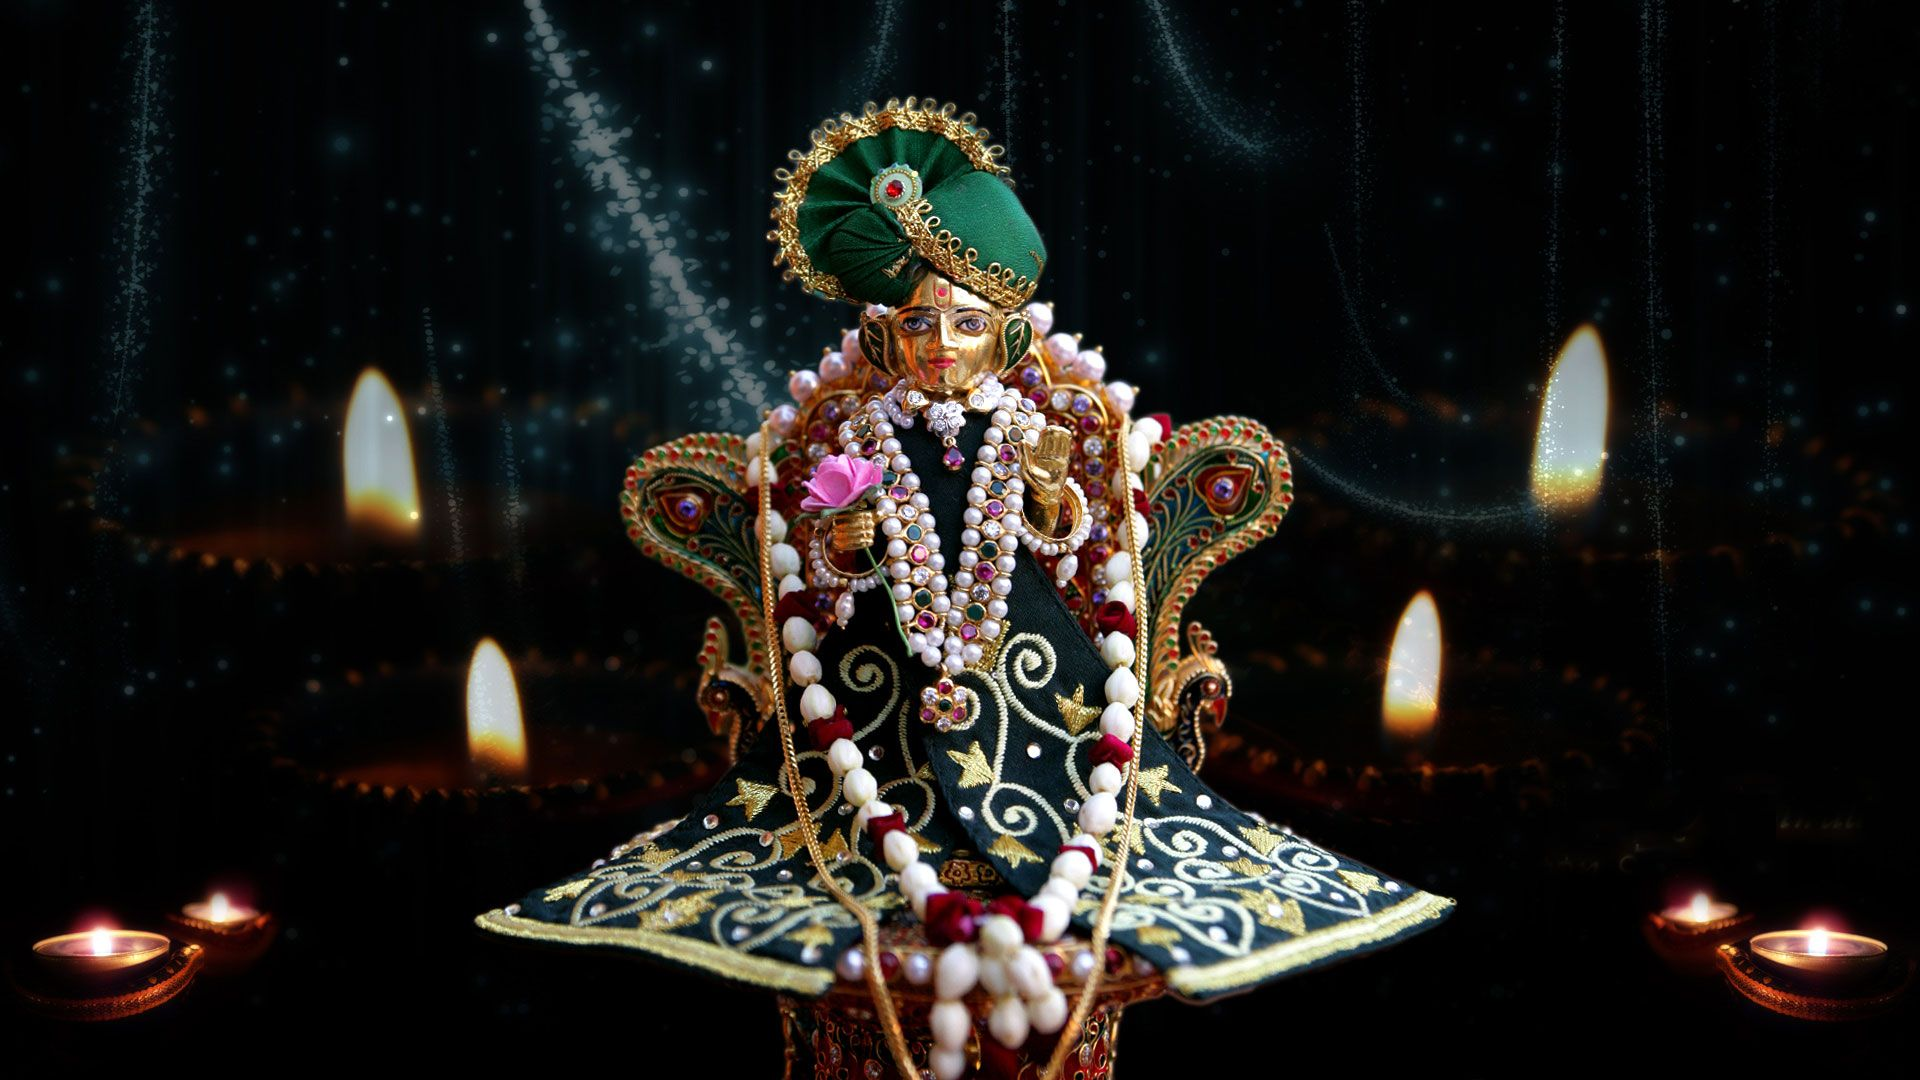 Swaminarayan Hd Wallpaper Free Download Wallpaper In 2019